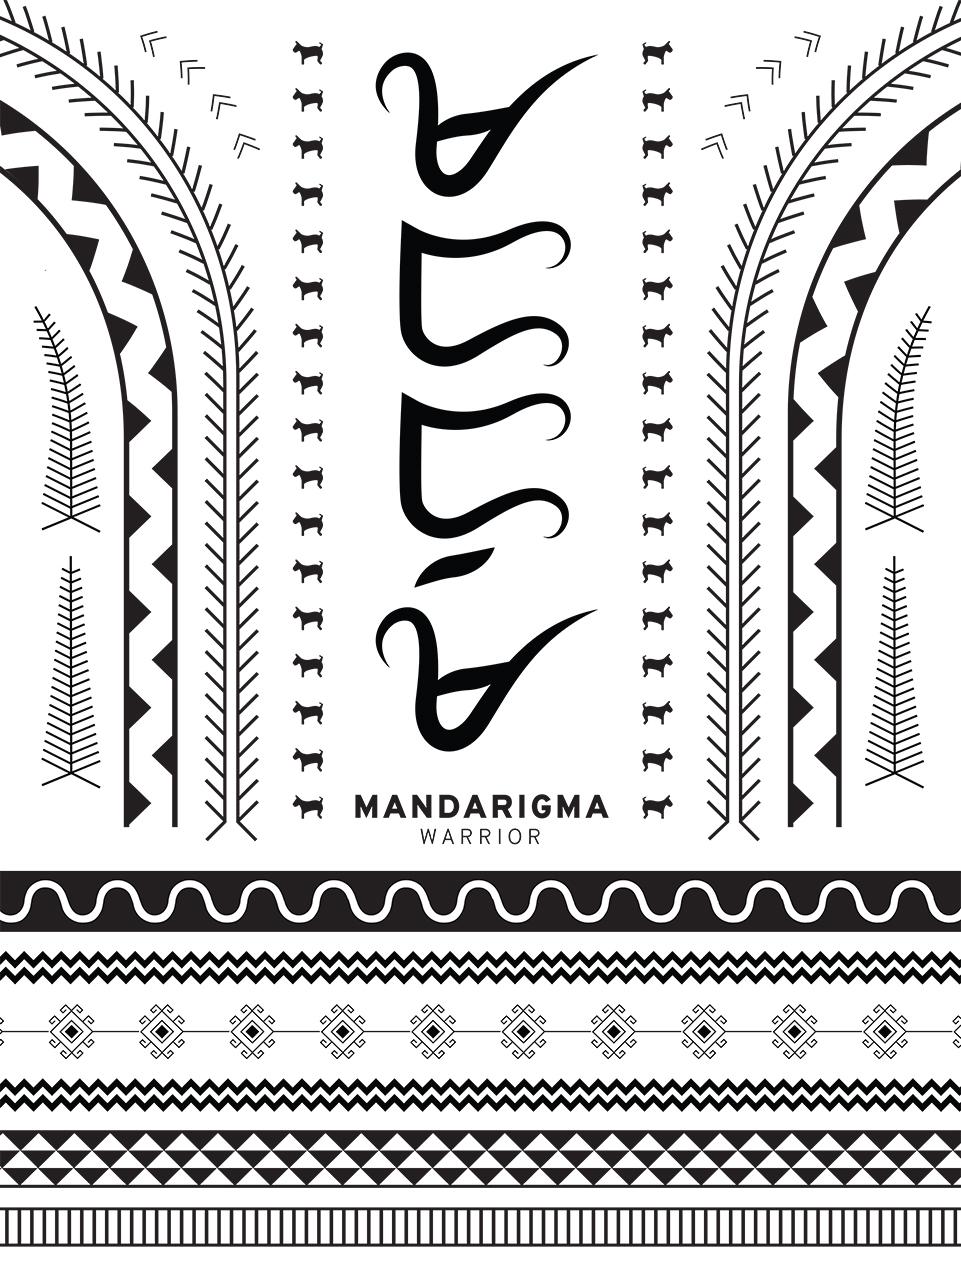 Mandarigma_Timpla.jpg